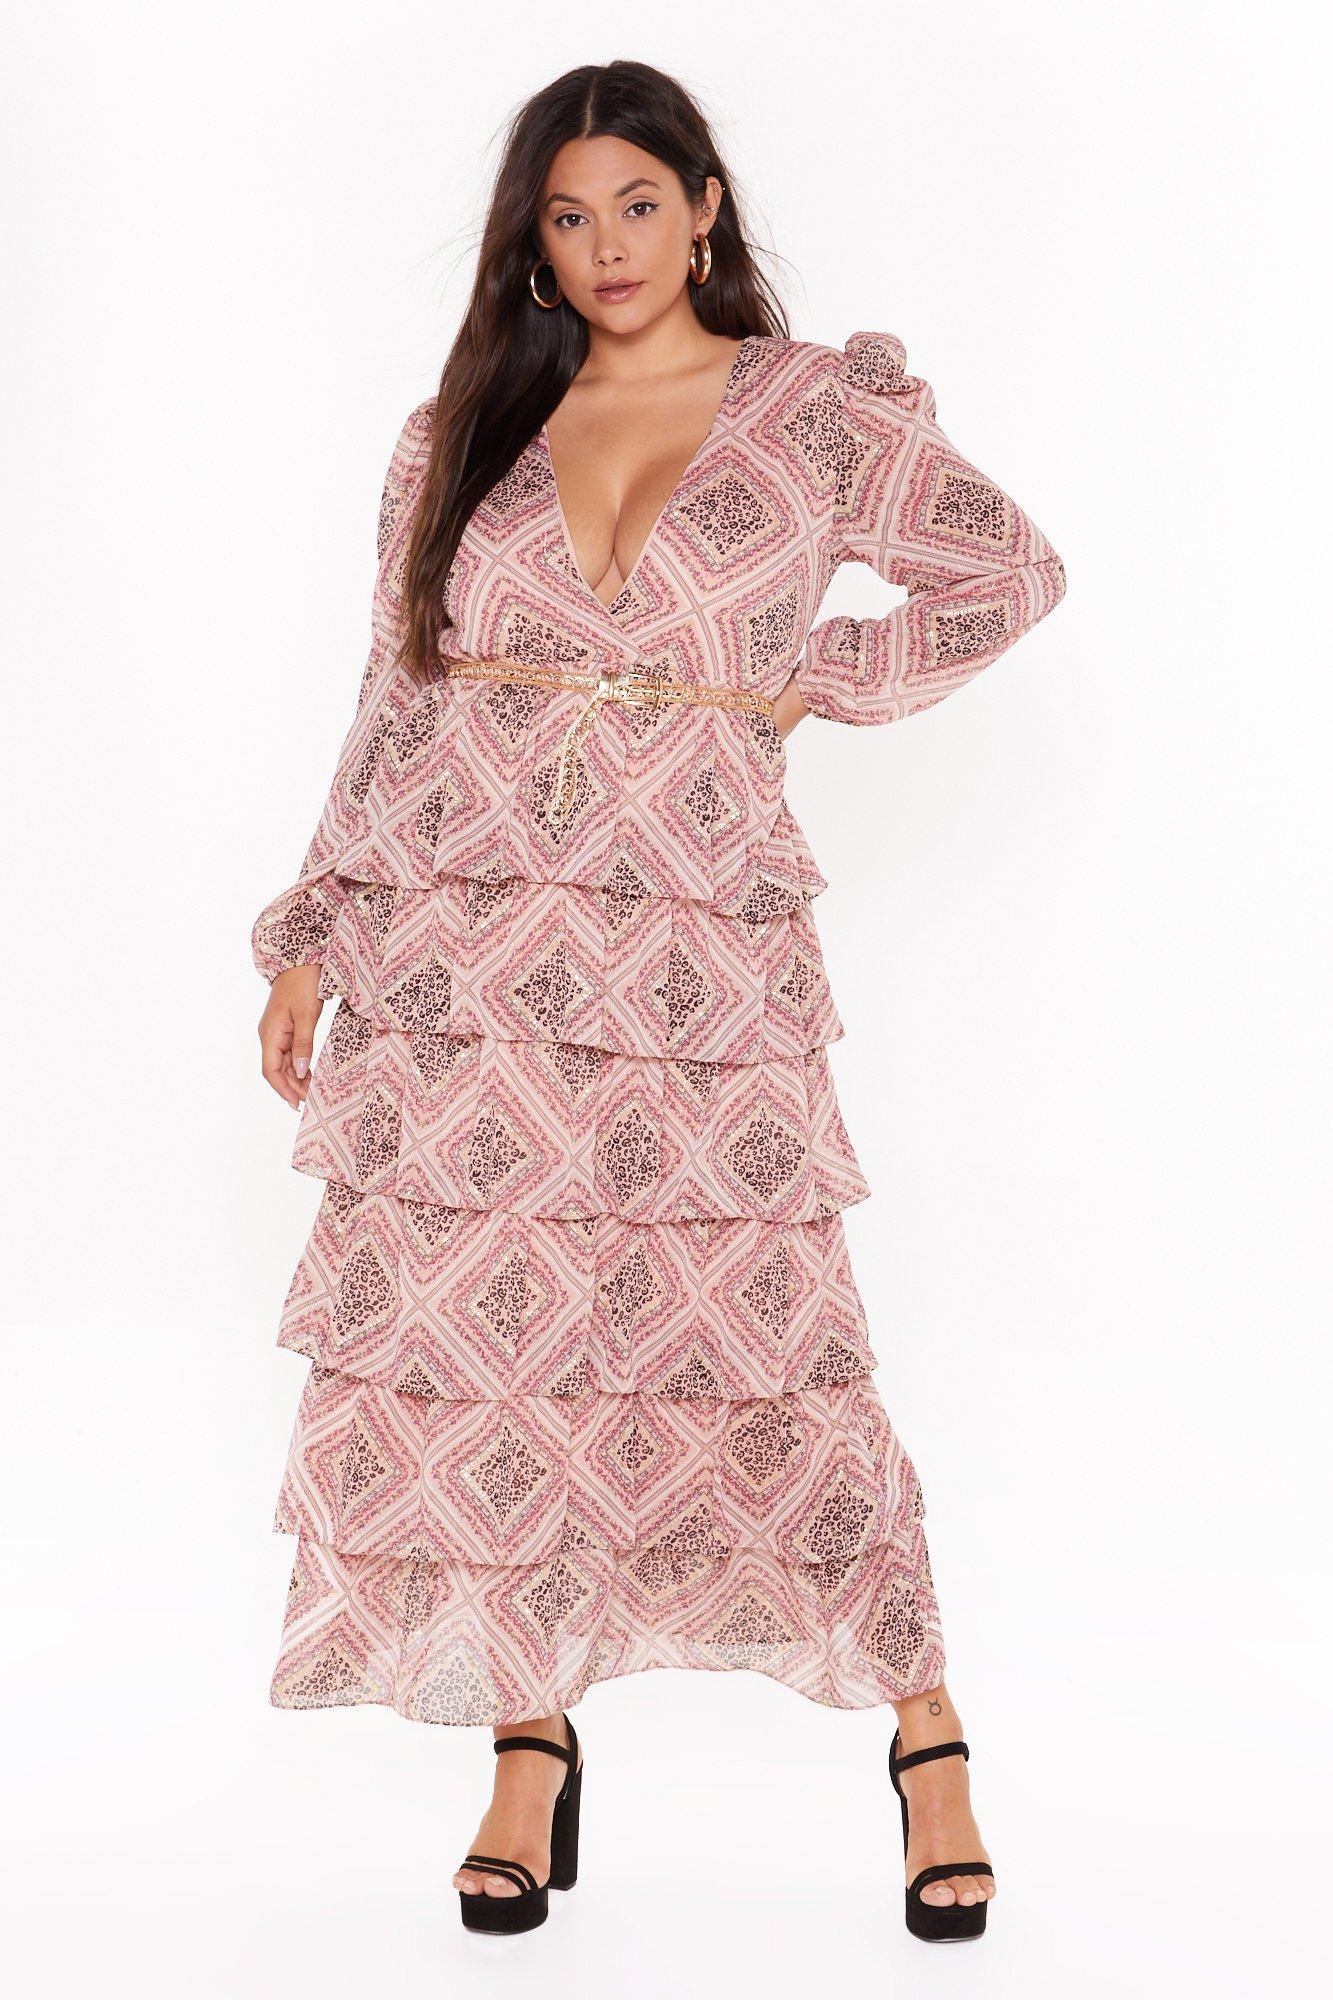 Paisley It Forward Tiered Maxi Dress 8